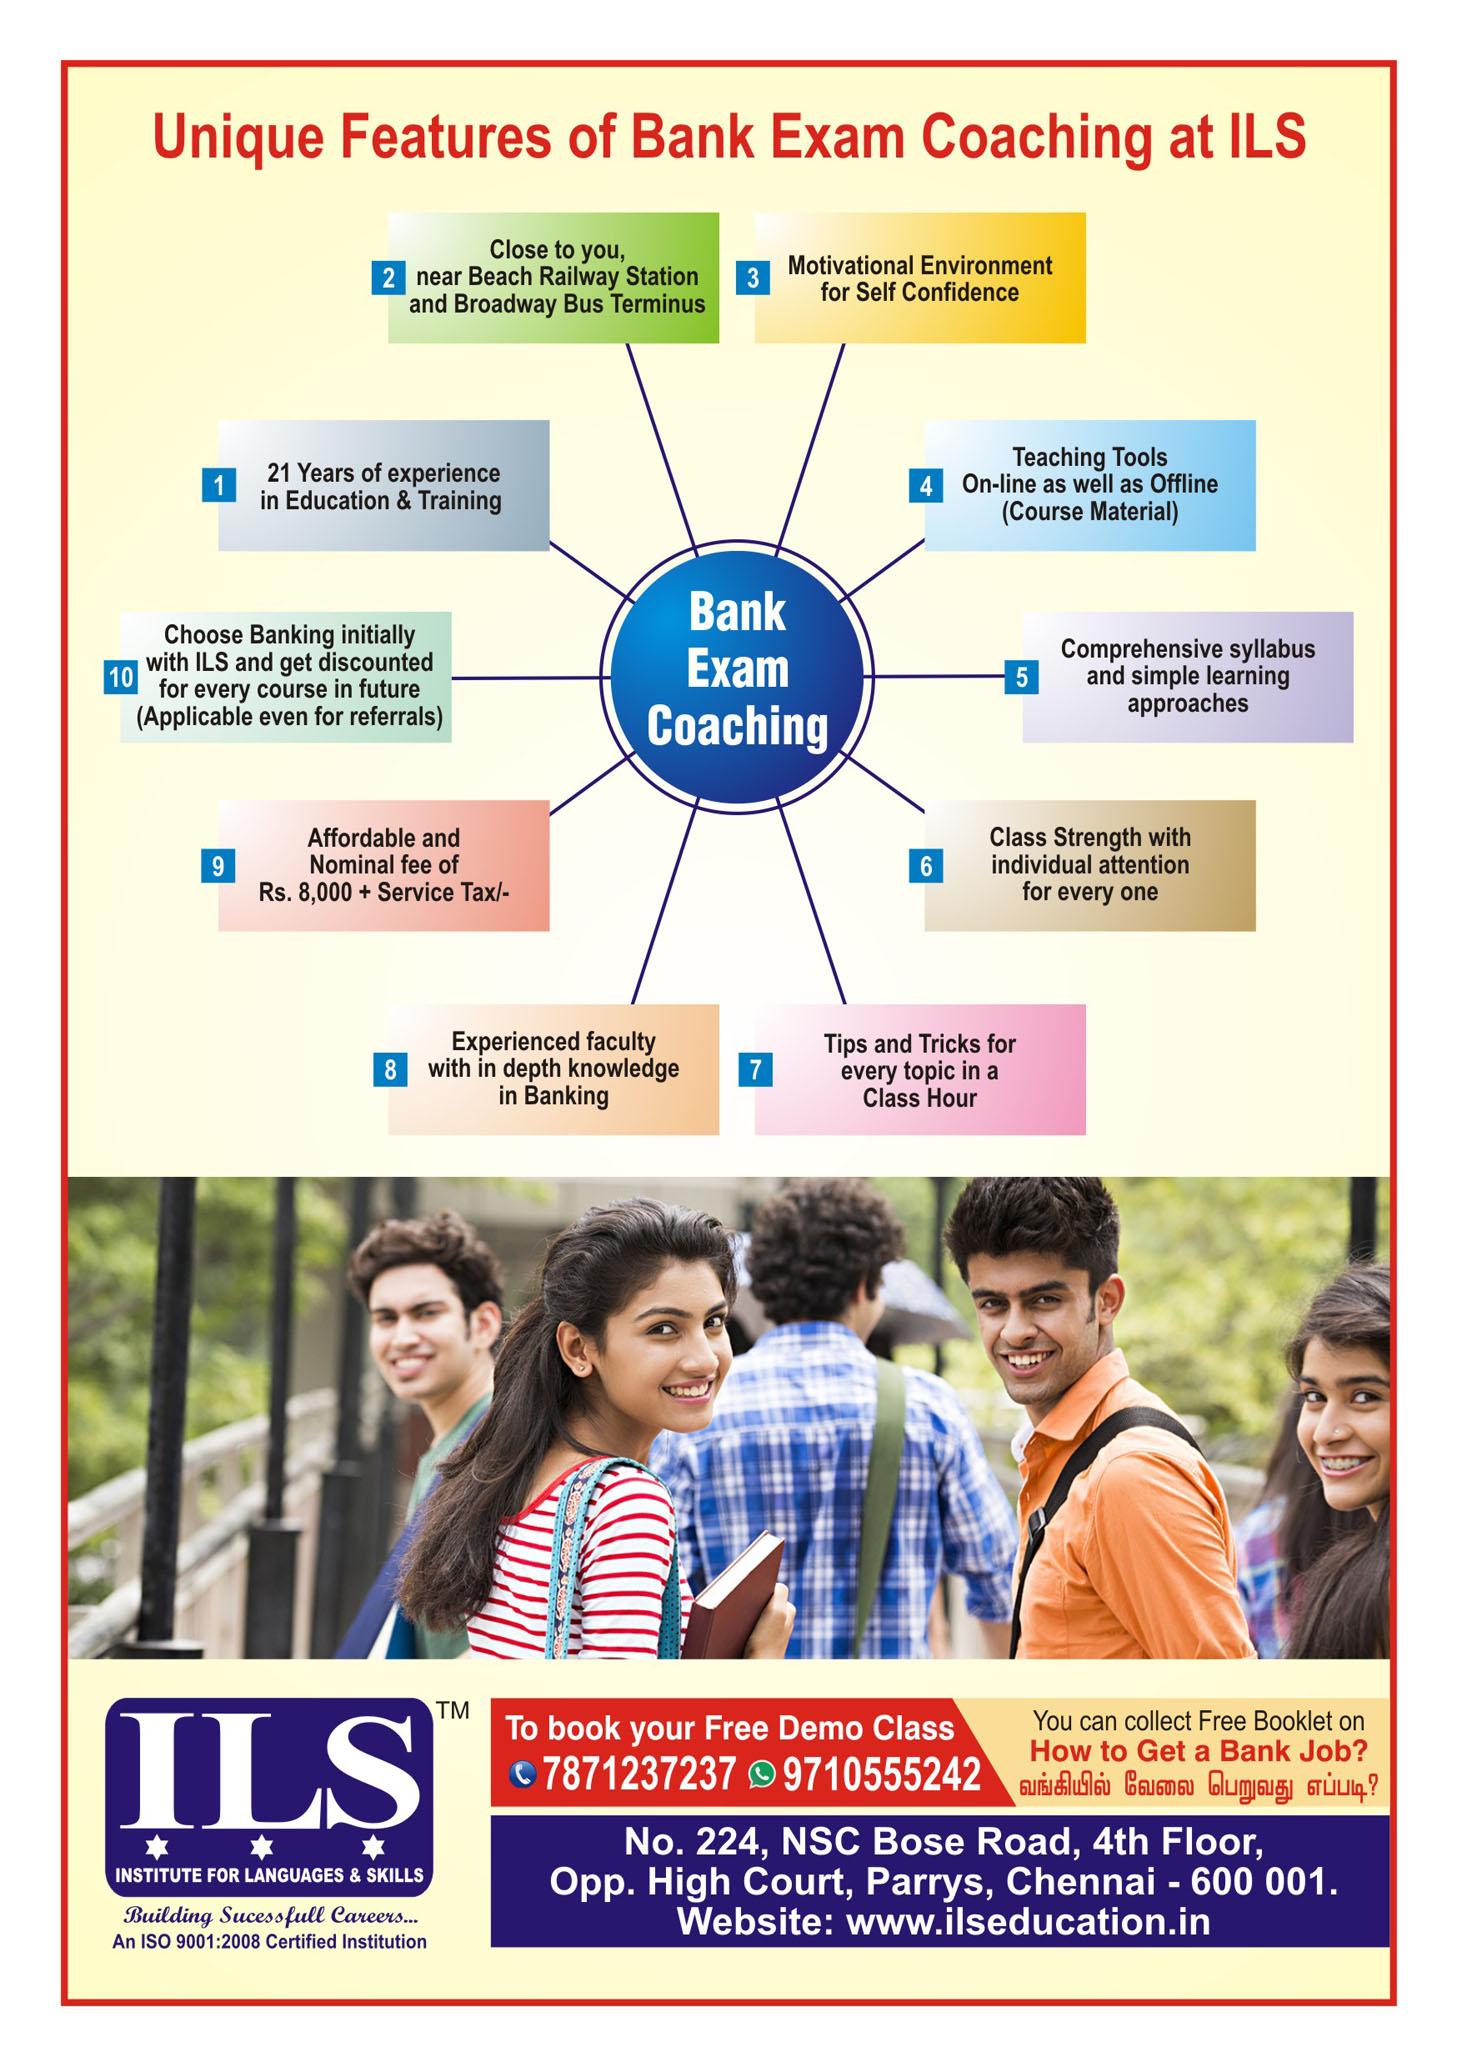 bank exams 2013 dates in chennai